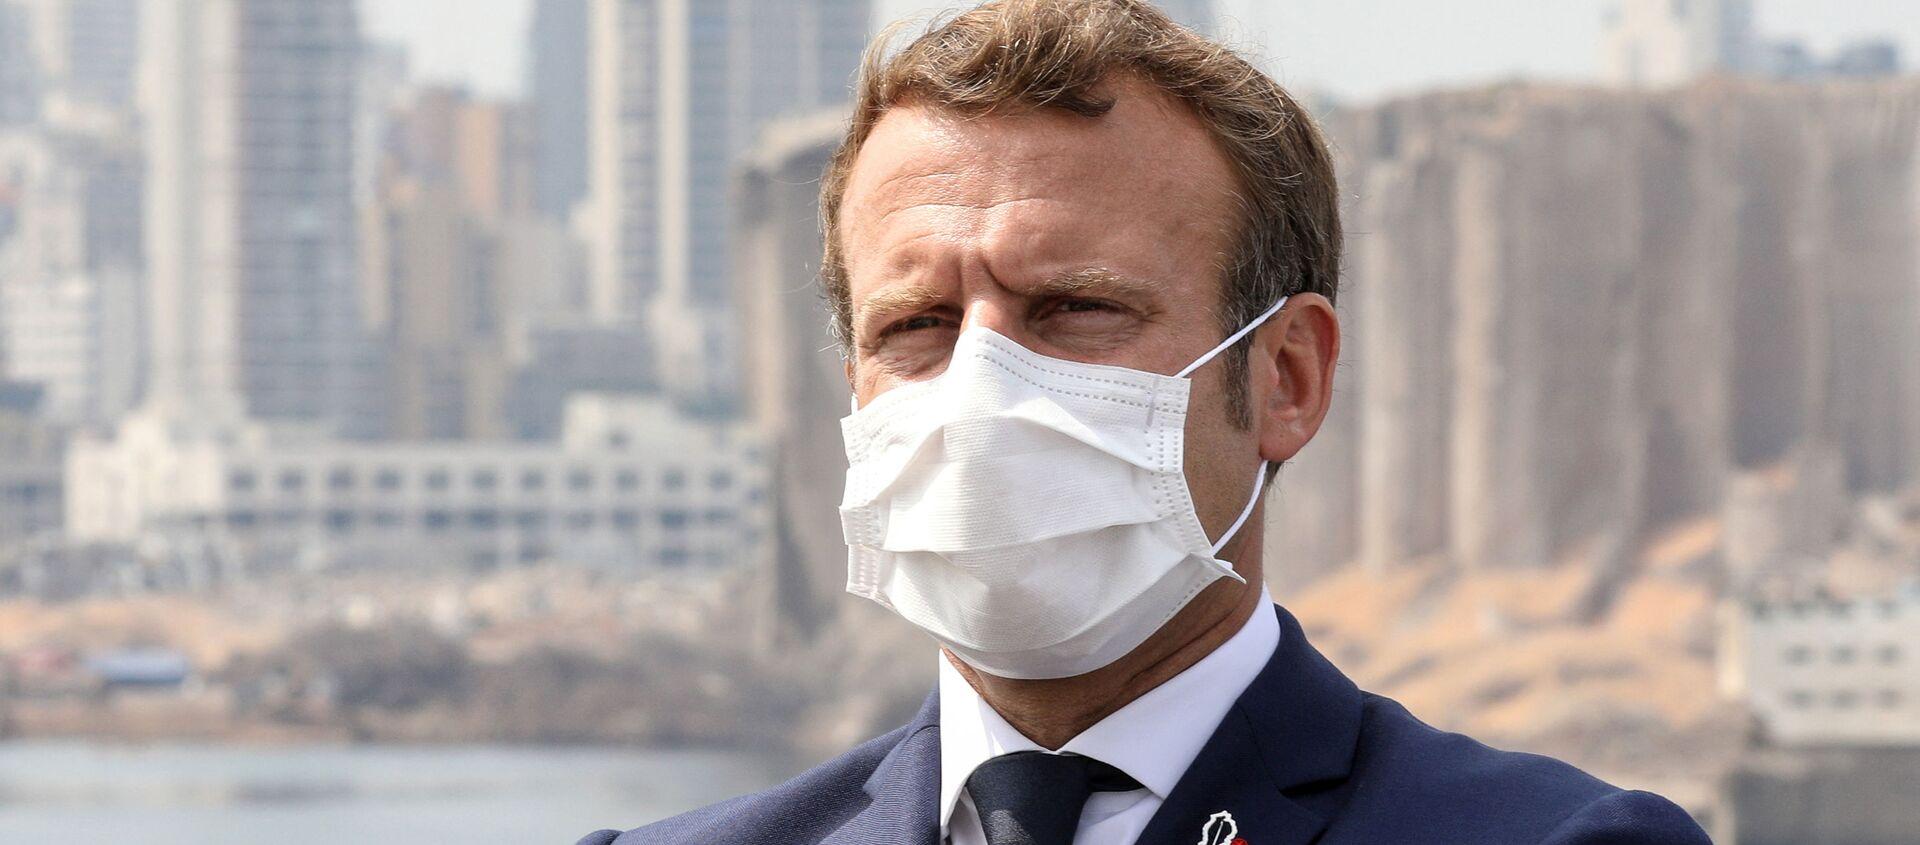 Emmanuel Macron à Beyrouth, le 1er septembre 2020 - Sputnik France, 1920, 29.09.2020